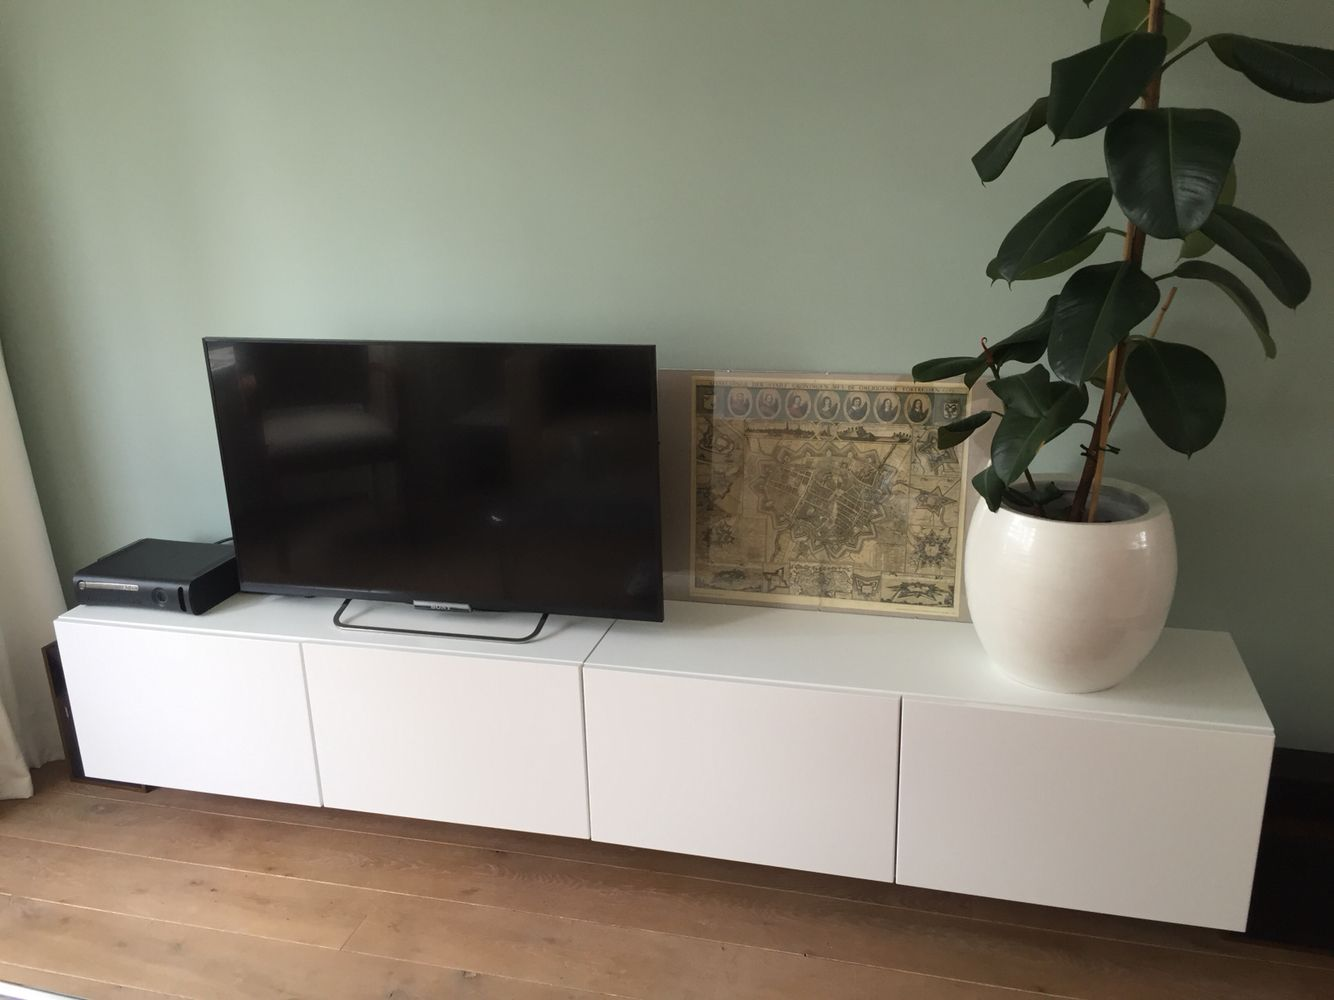 Tv meubel, Besta Ikea, Early Dew Flexa   woonkamer   Pinterest   Living rooms, Room and Interiors